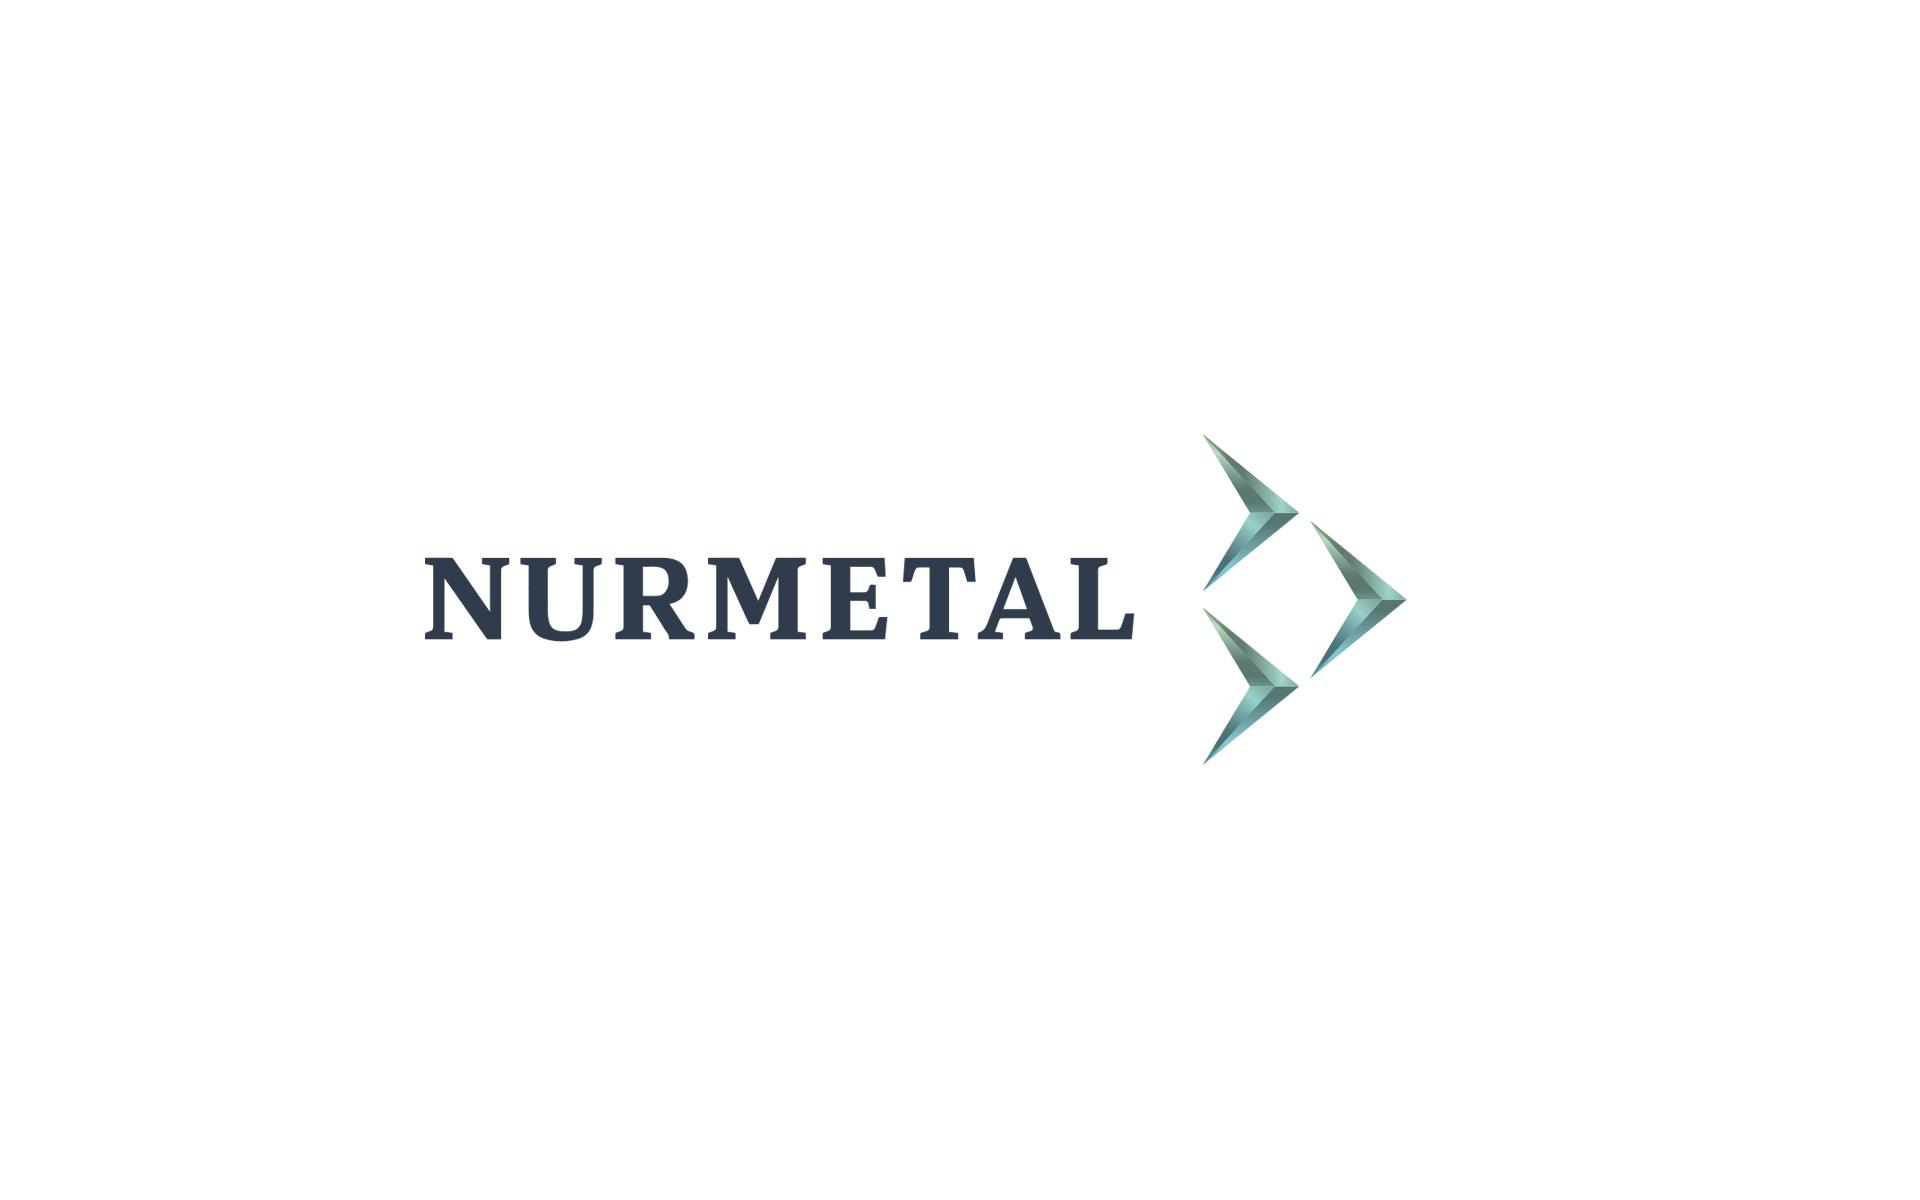 nurmetal01